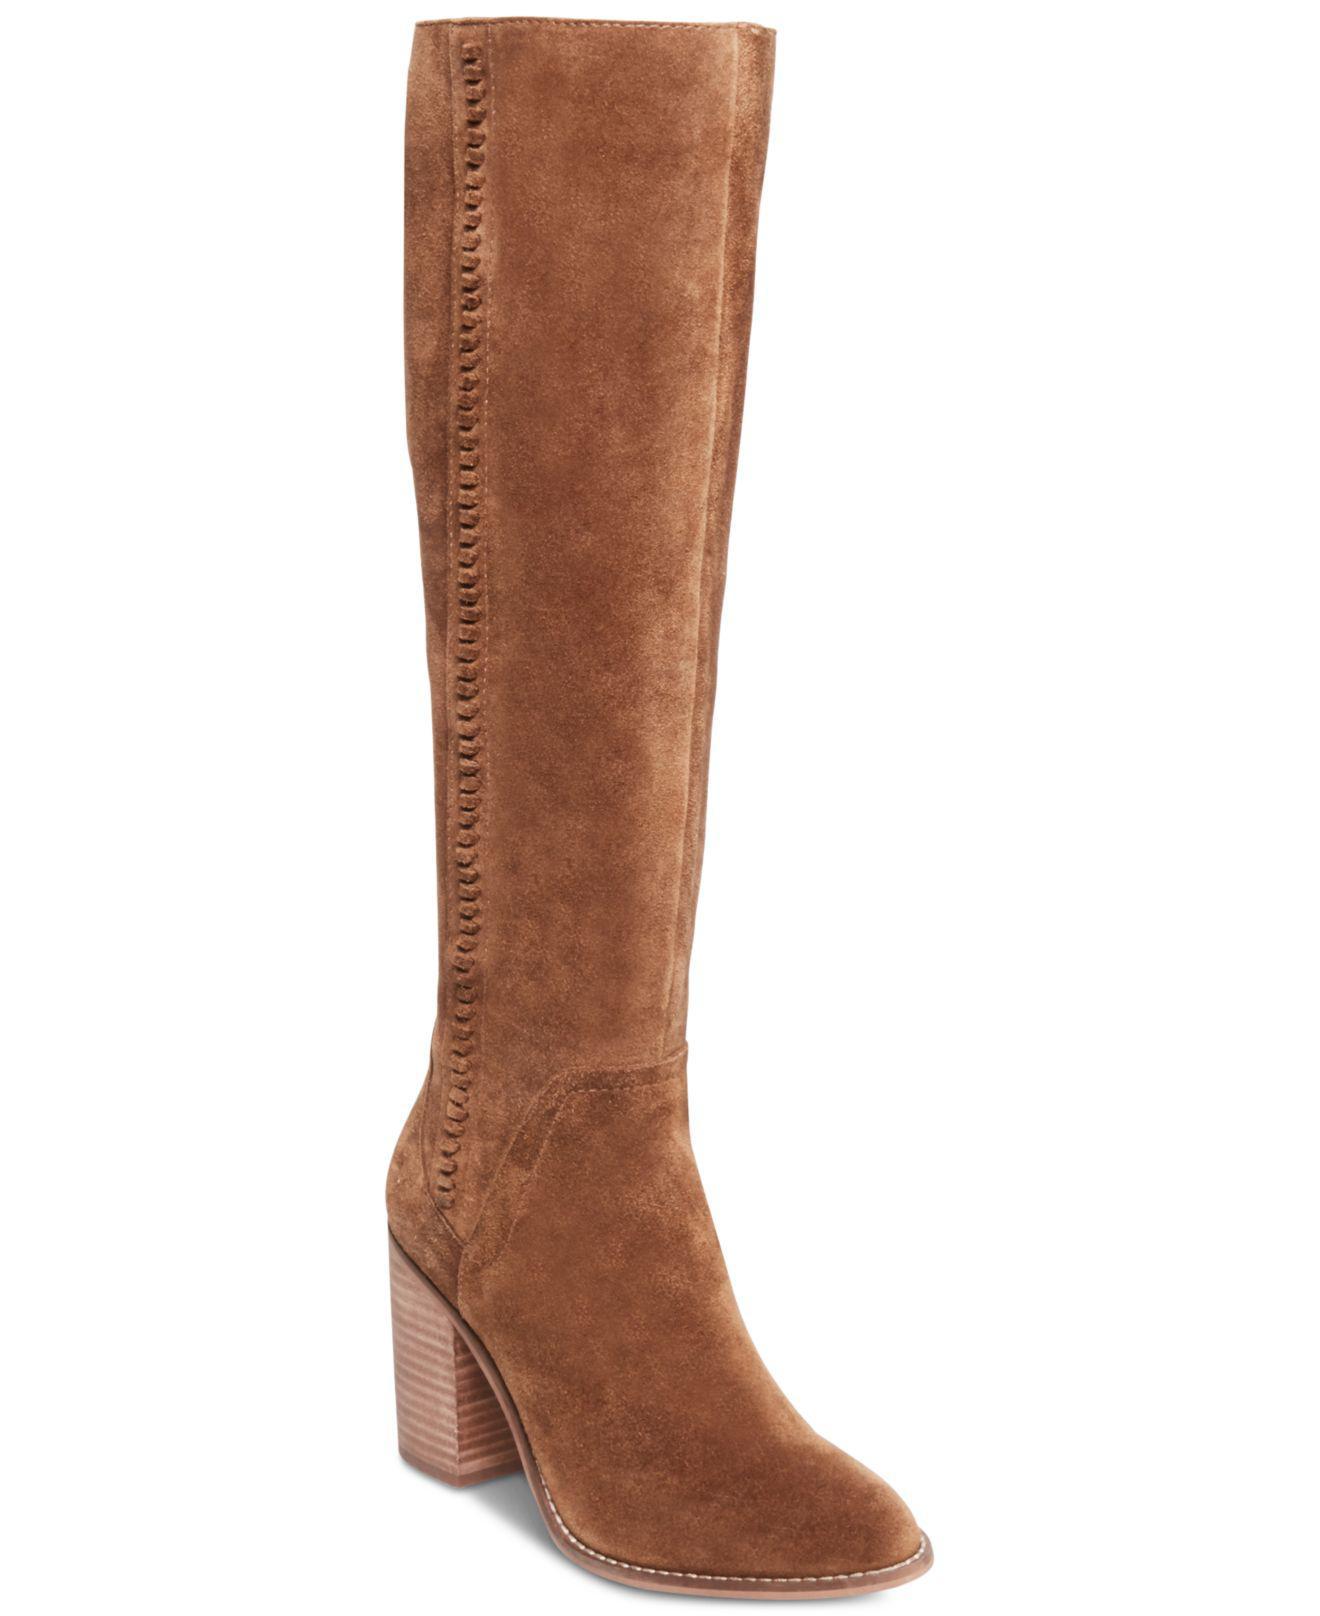 5ac96ae2967 Lyst - Steve Madden Roxana Knee High Boot in Brown - Save 7%